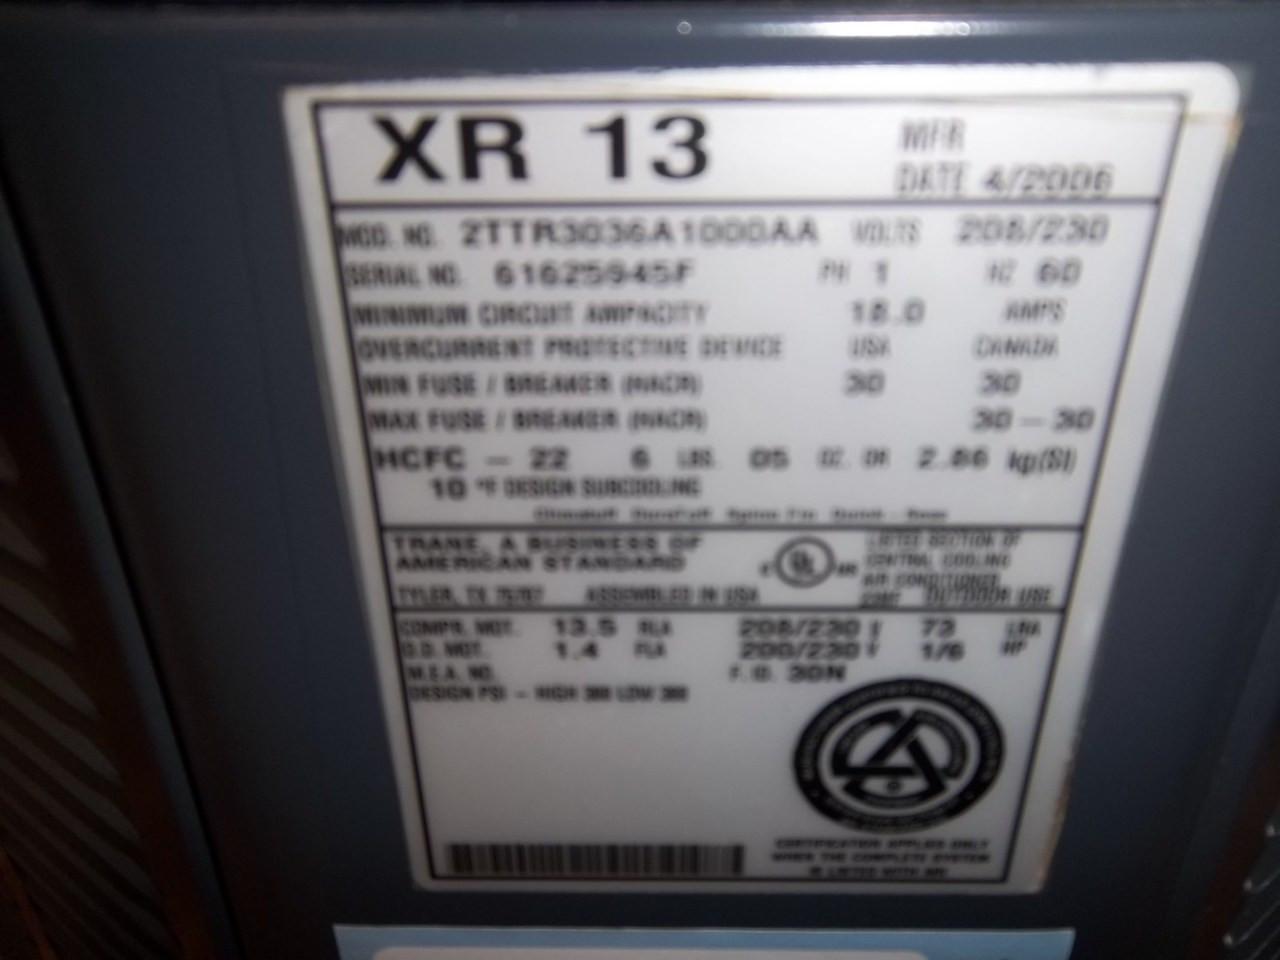 TRANE Used AC Condenser 2TTR3036A1000AA 2H